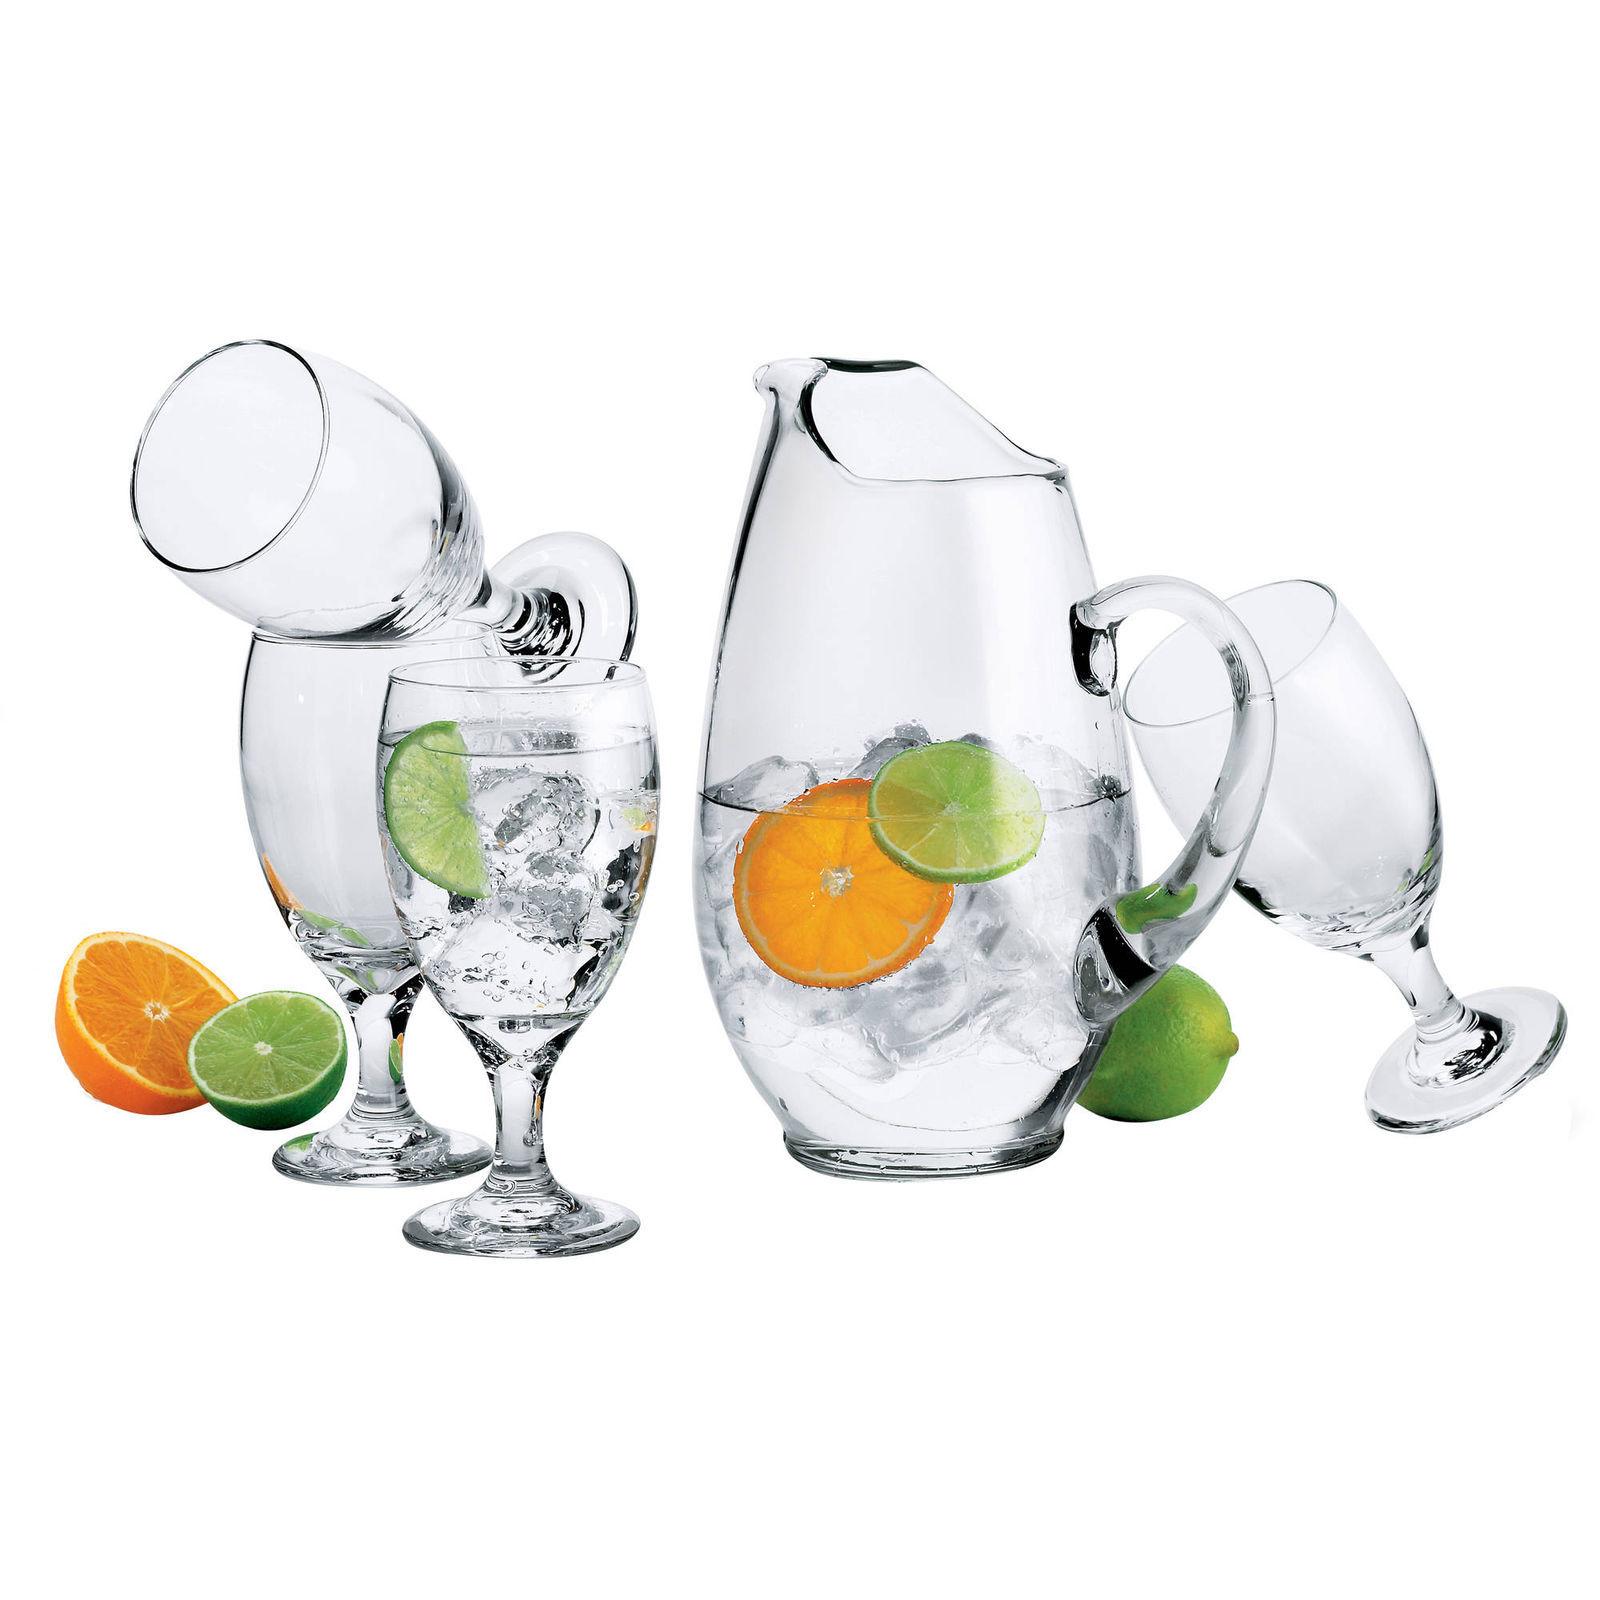 Set of 7 Libbey Carolina Clear Glass Pitcher and Glass Set New